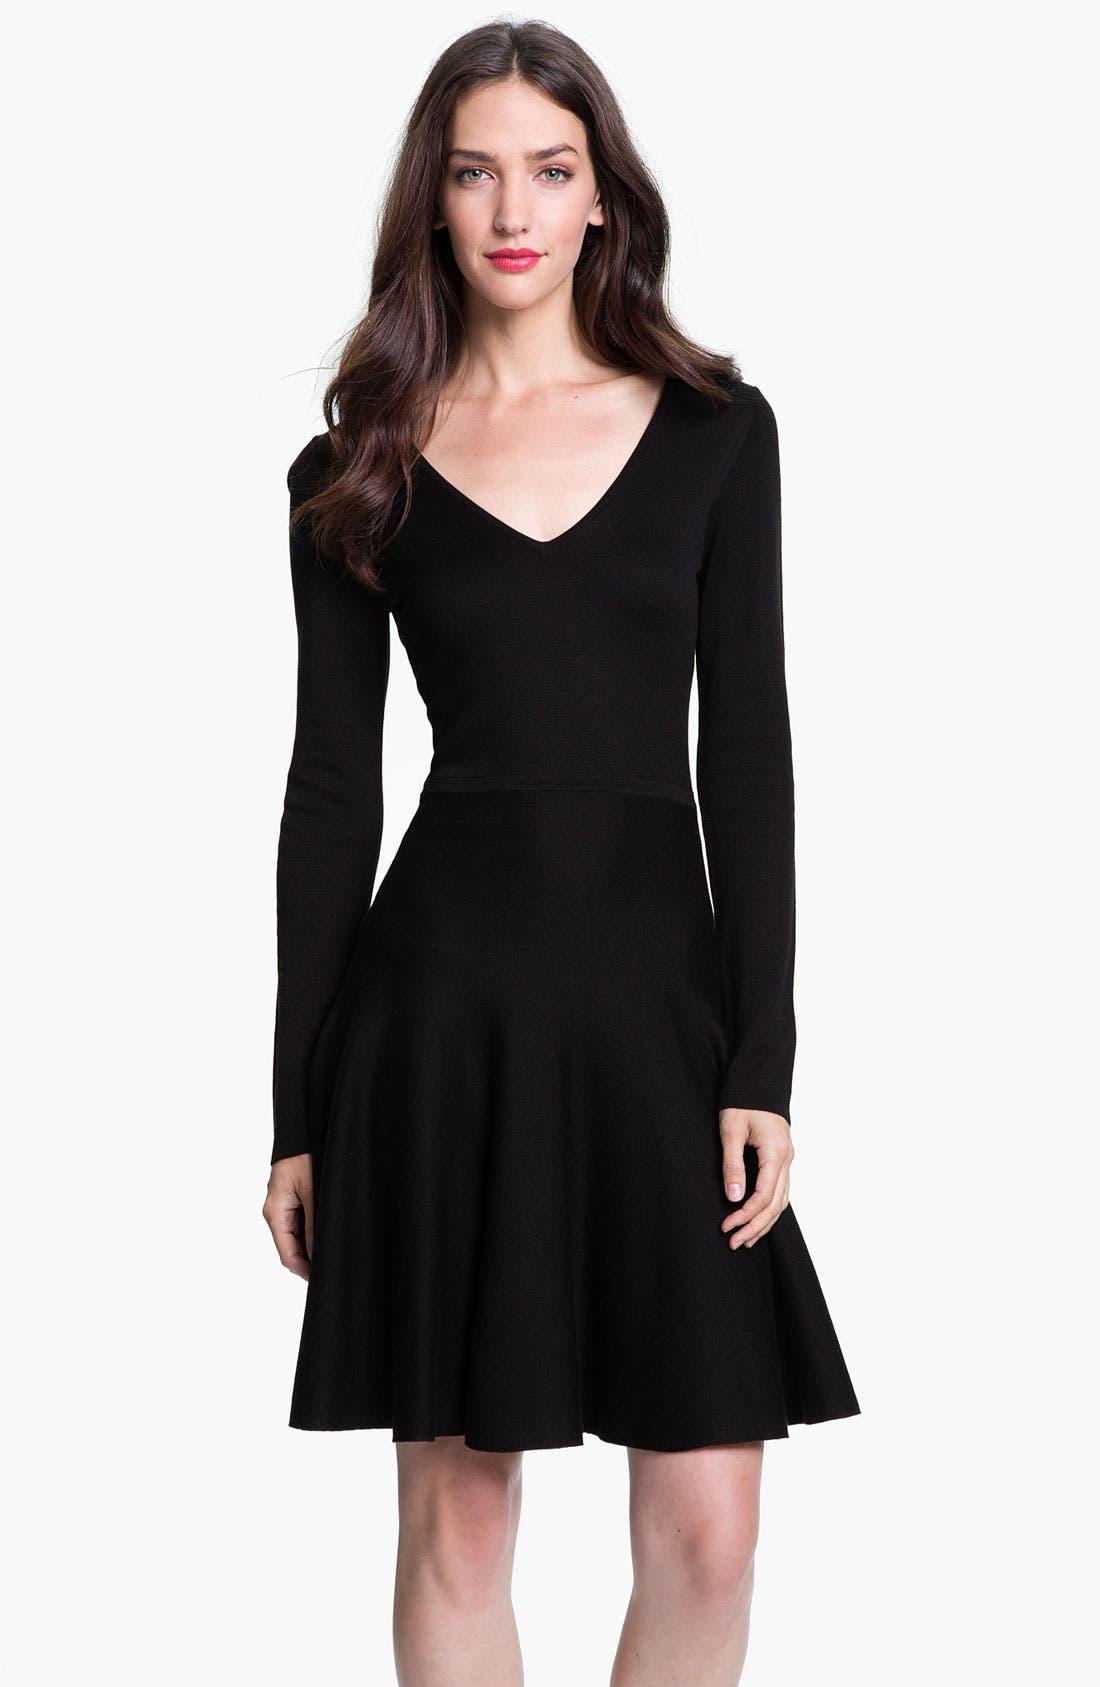 Alternate Image 1 Selected - BCBGMAXAZRIA Silk Blend A-Line Dress